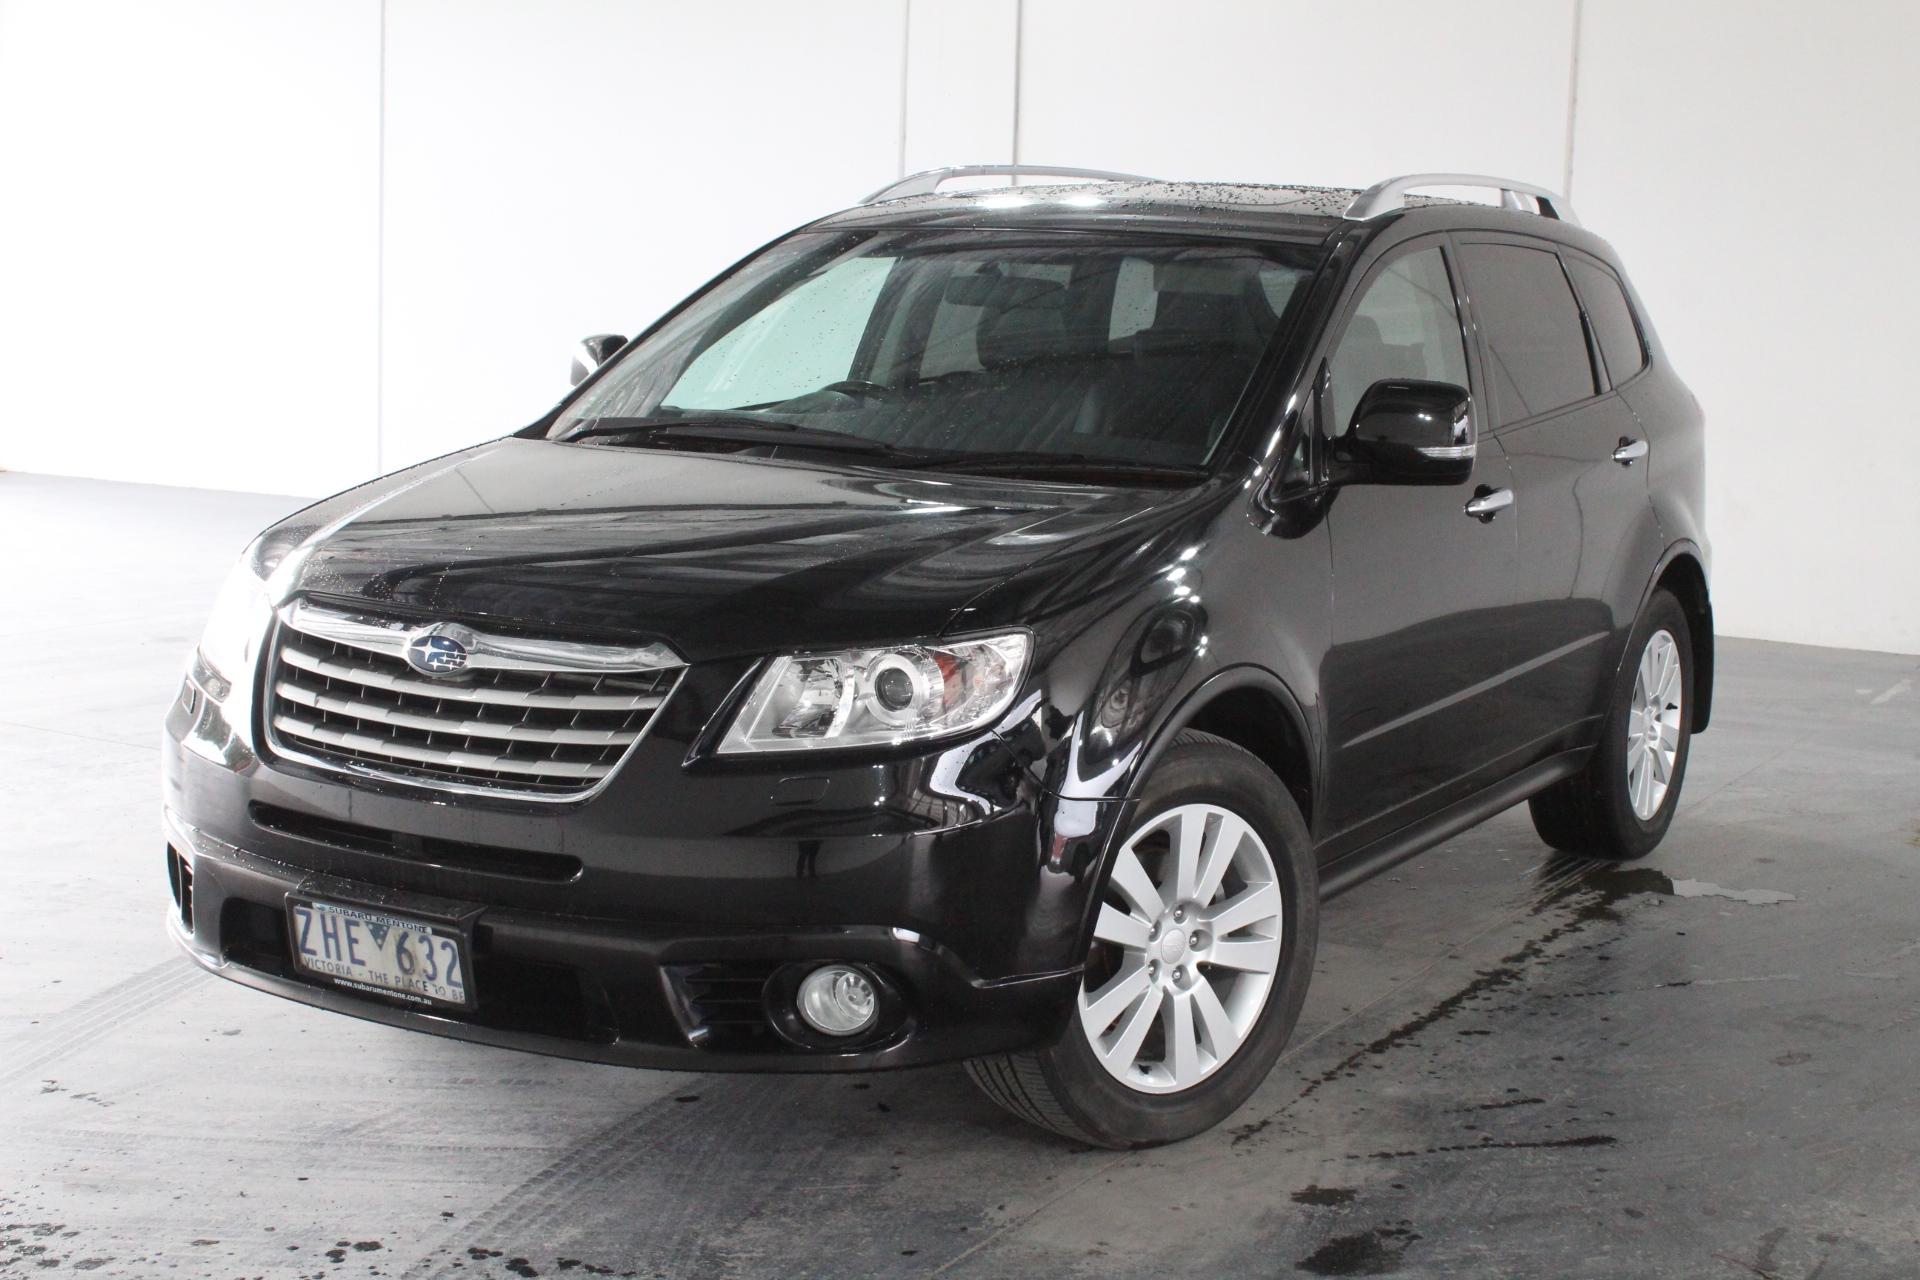 2012 Subaru Tribeca 3.6R Premium B9 Automatic 7 Seats Wagon